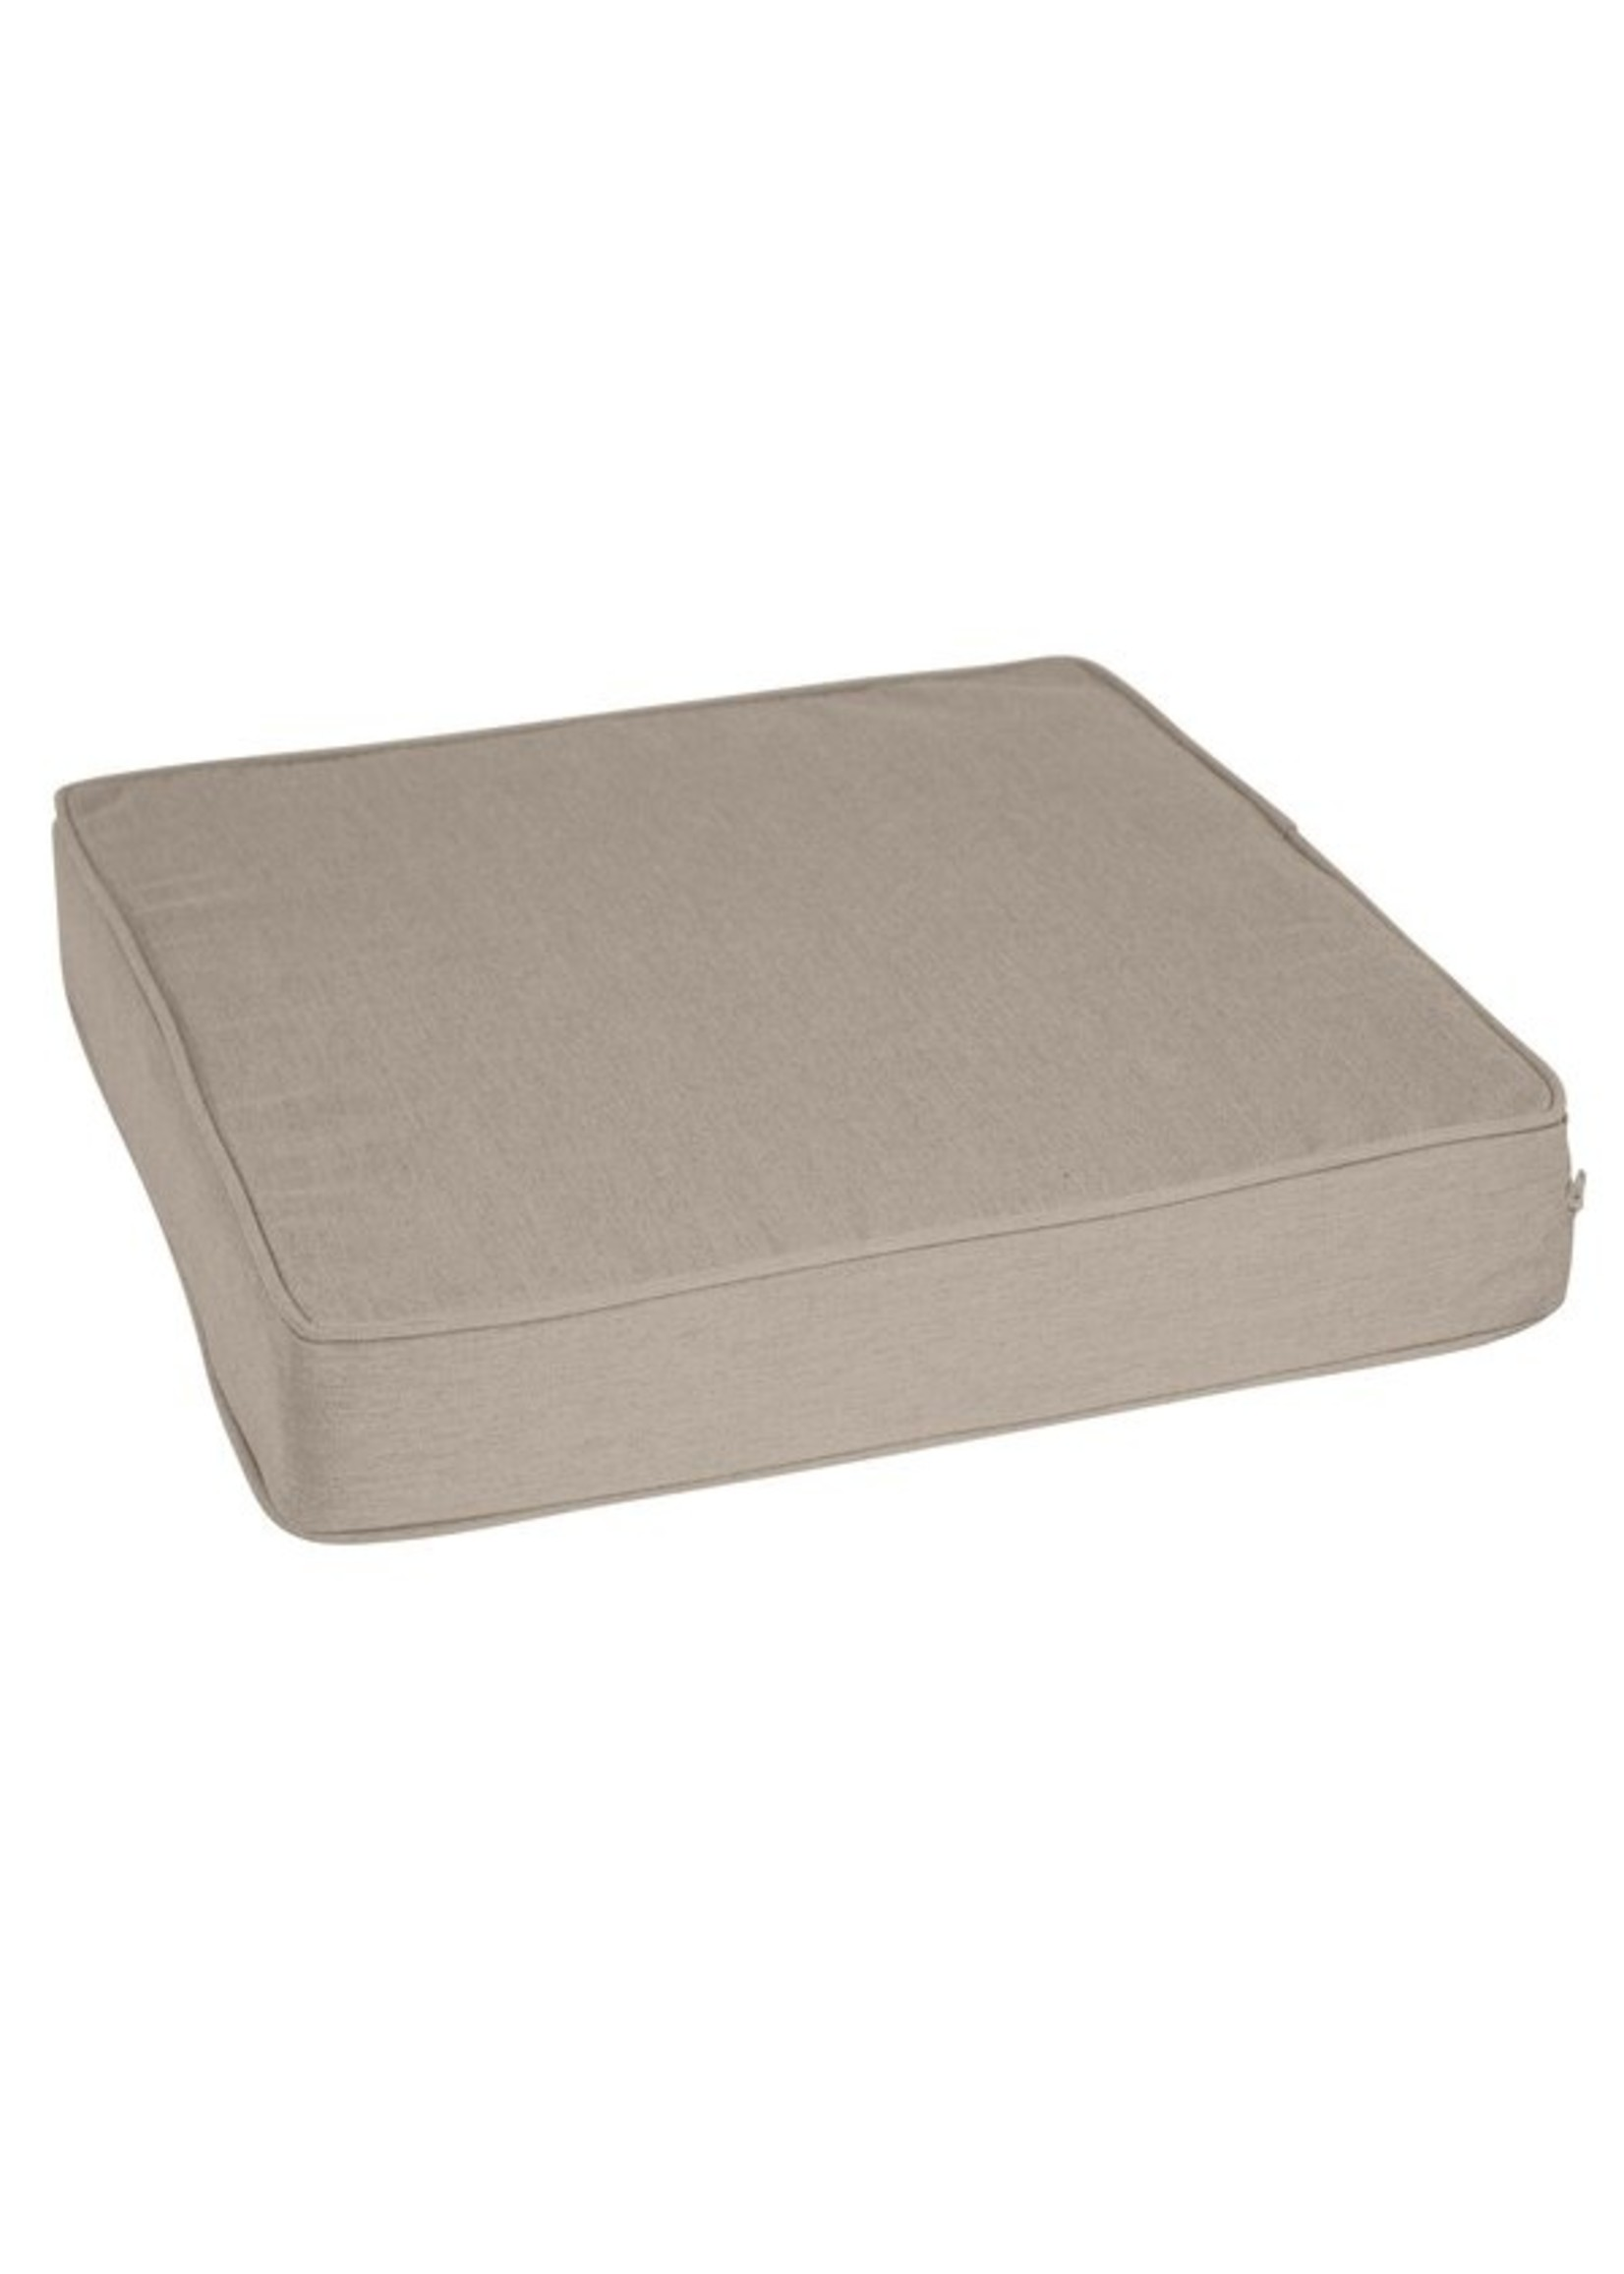 *Outdoor Sunbrella Seat Cushion - Cast Ash - Set of 2 (Final Sale)